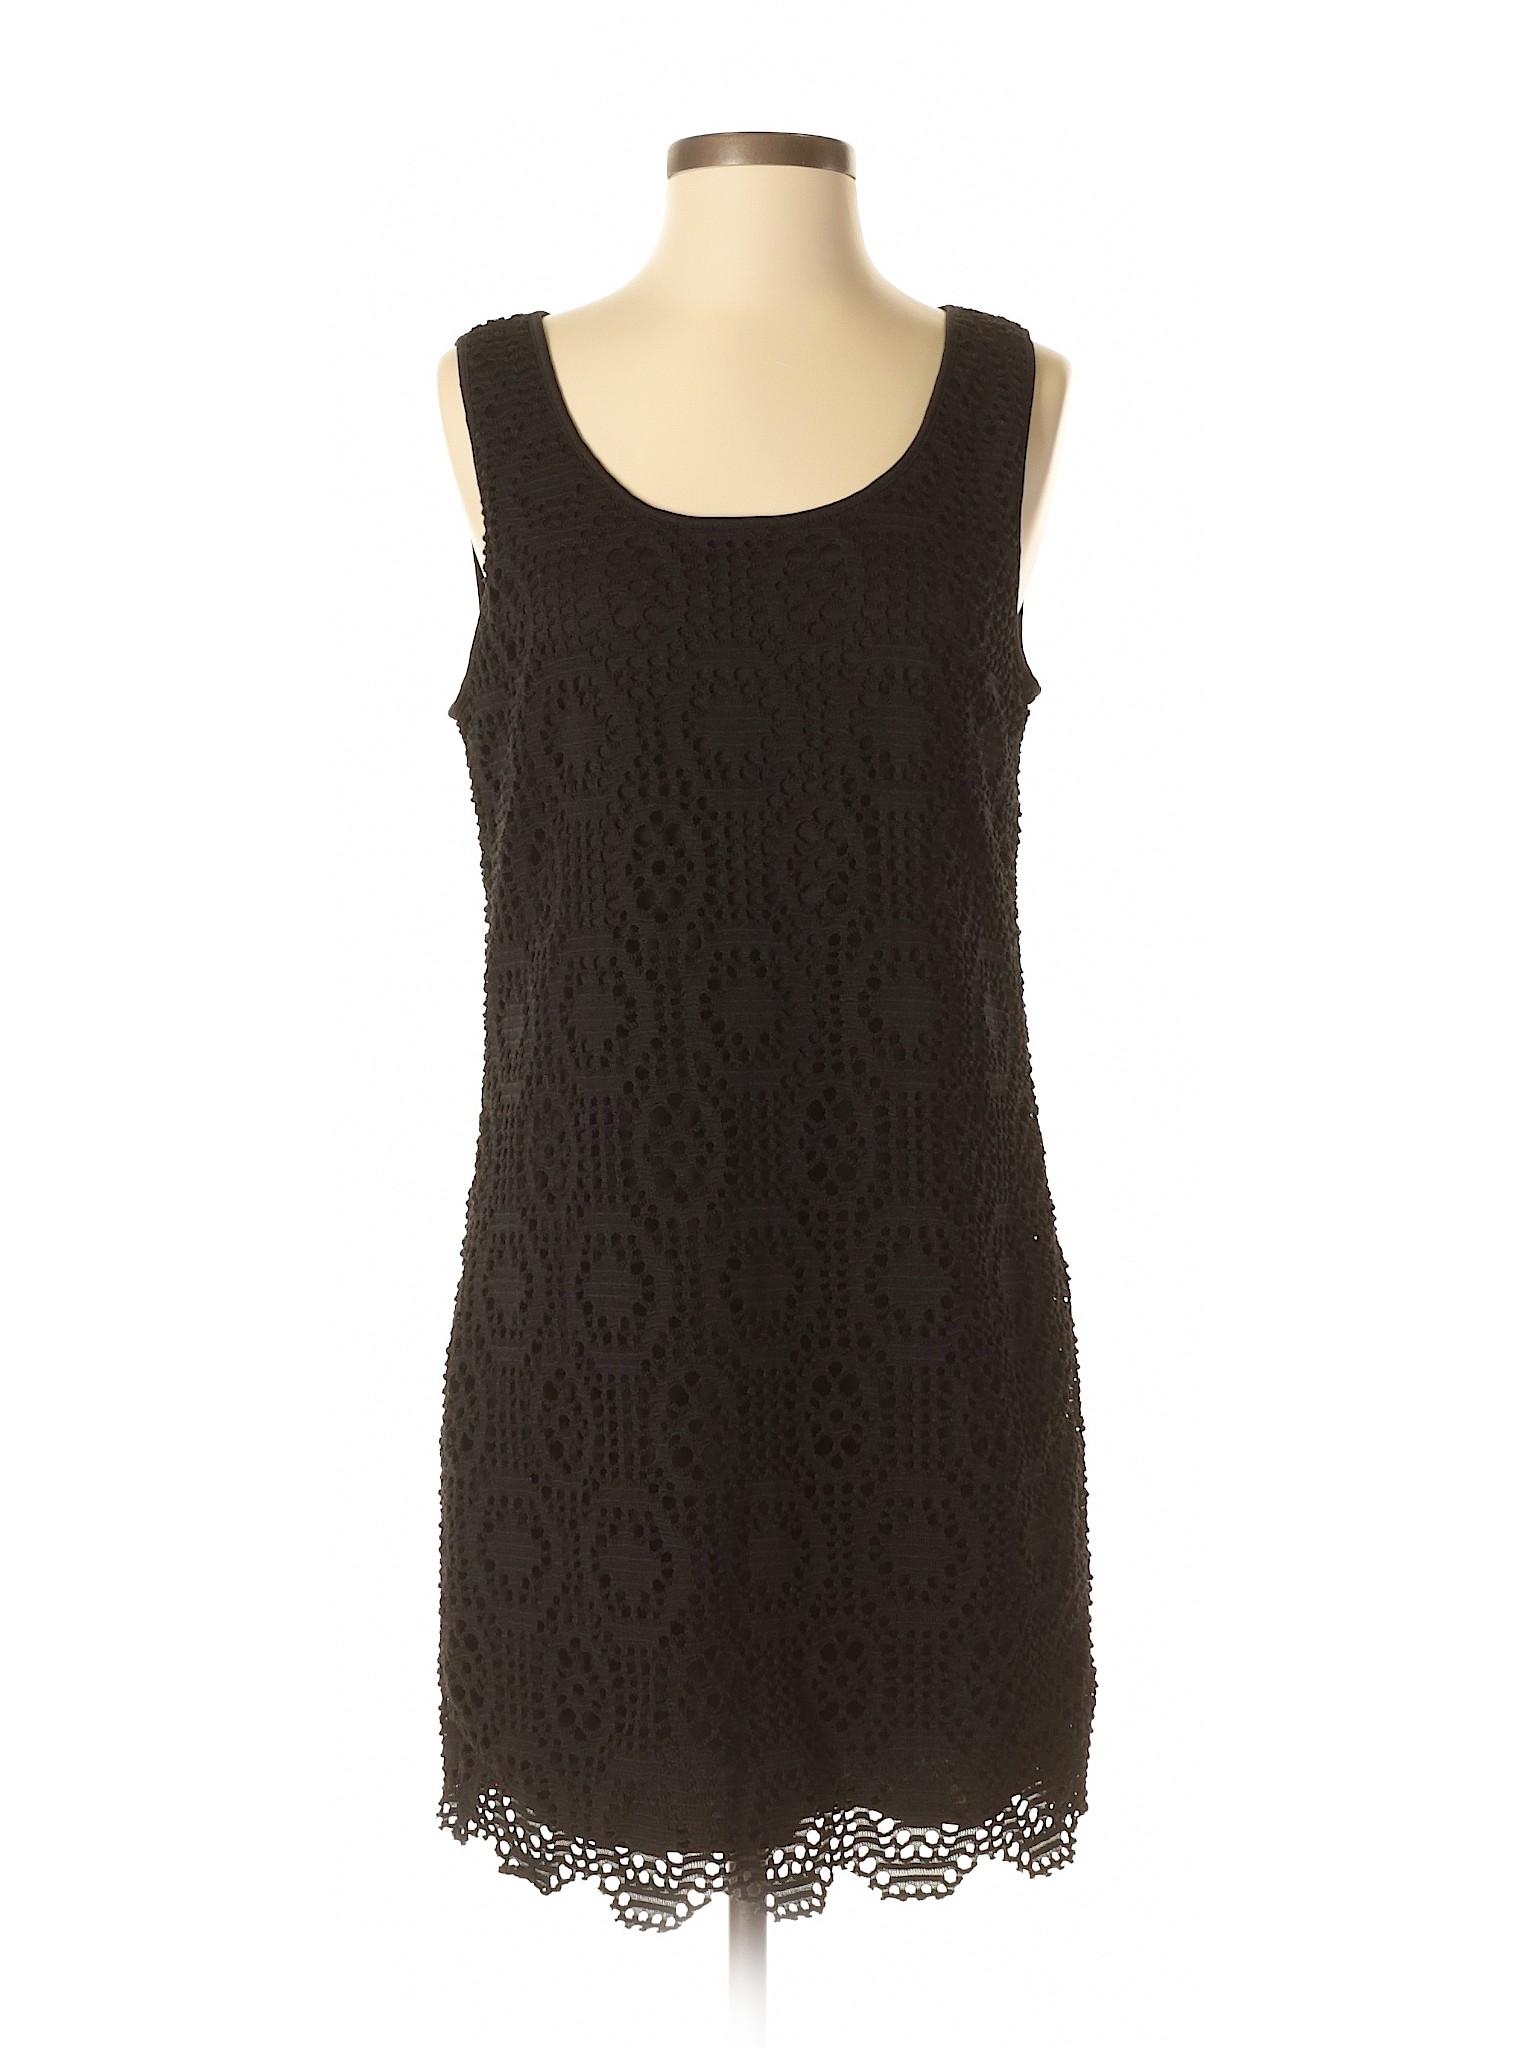 Casual Selling Dress Casual DKNY DKNY Dress Selling DKNY Selling Casual Dress Selling 44pwq1vR